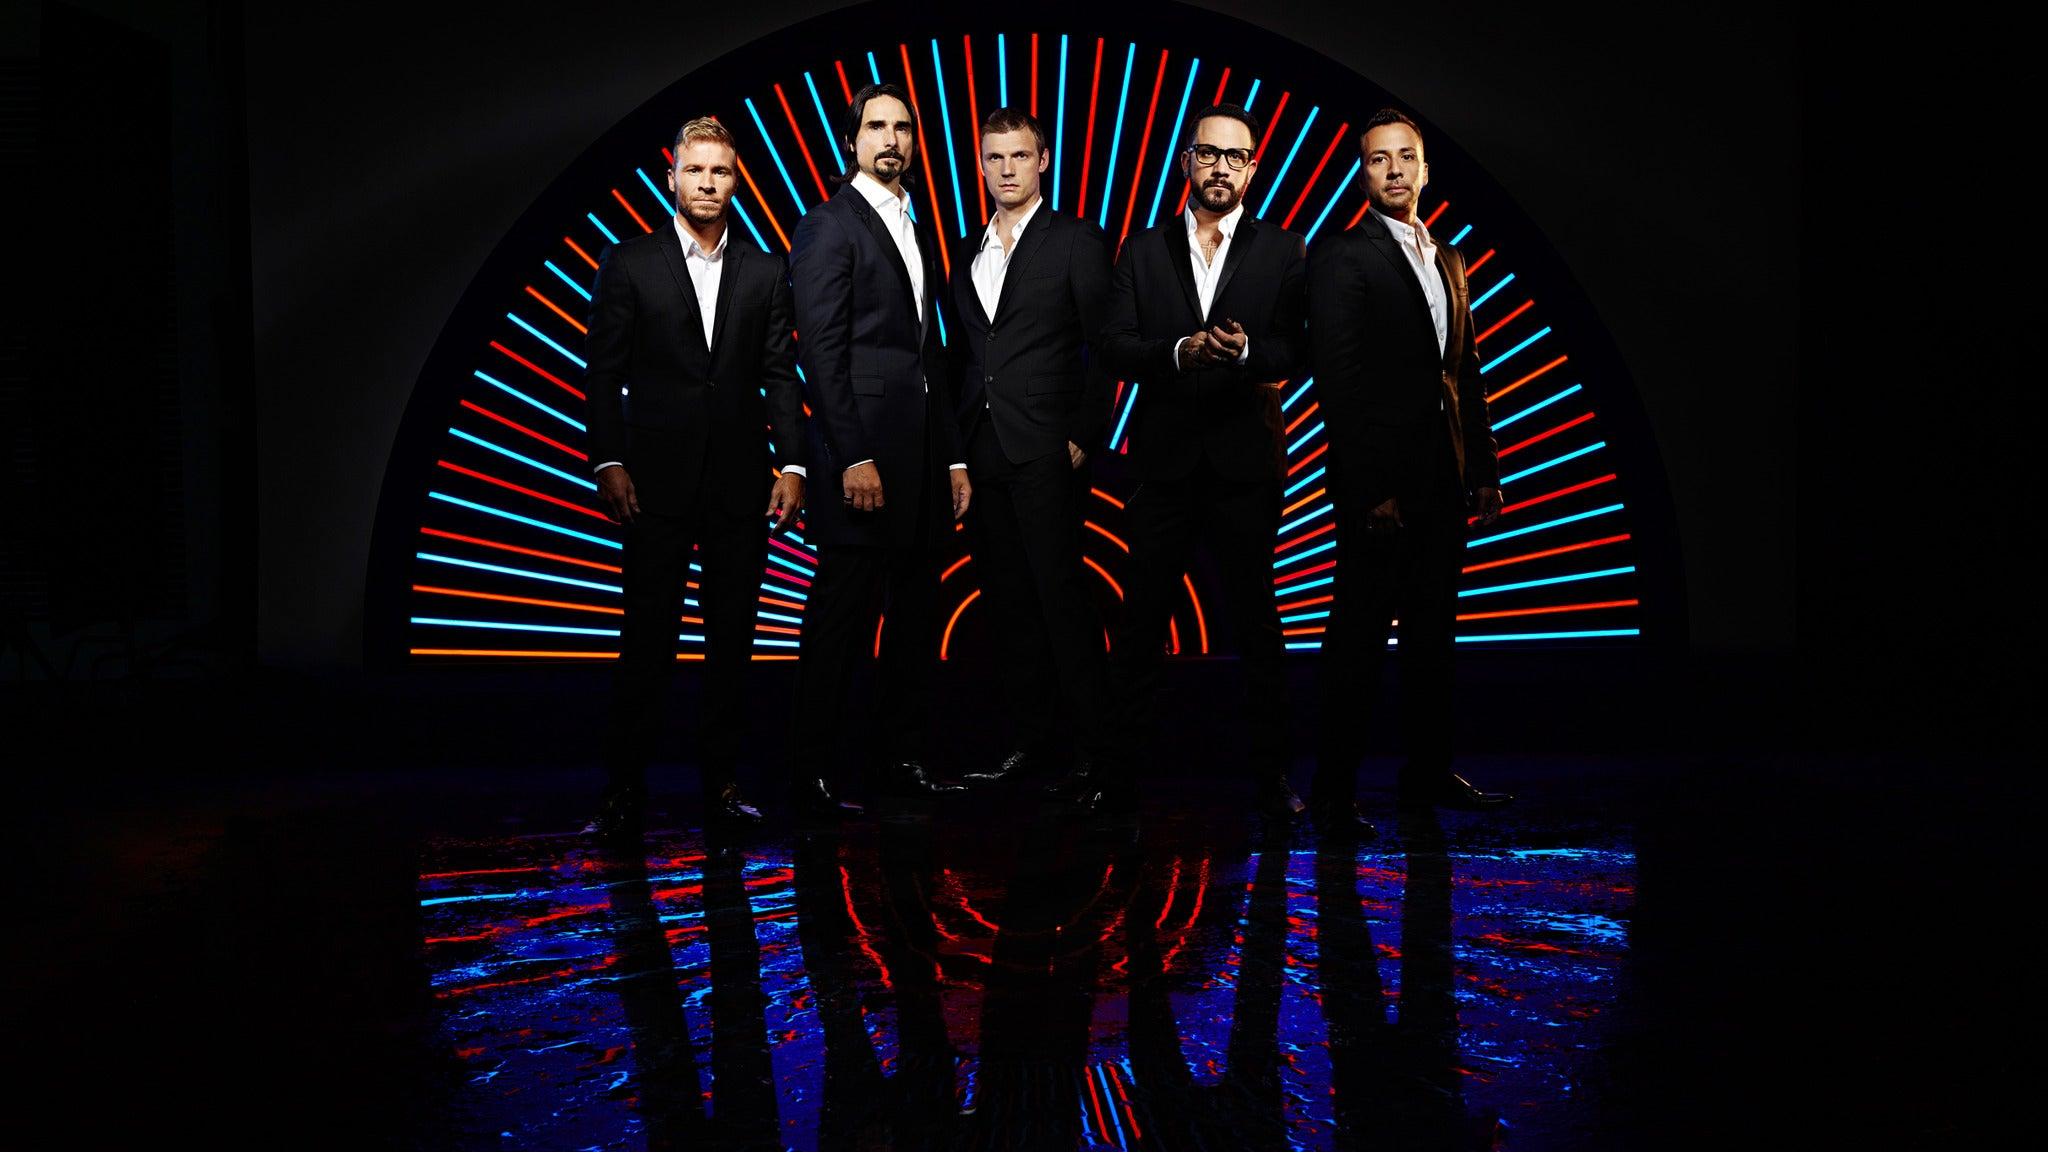 Backstreet Boys All Star Christmas at Mohegan Sun Arena - Uncasville, CT 06382